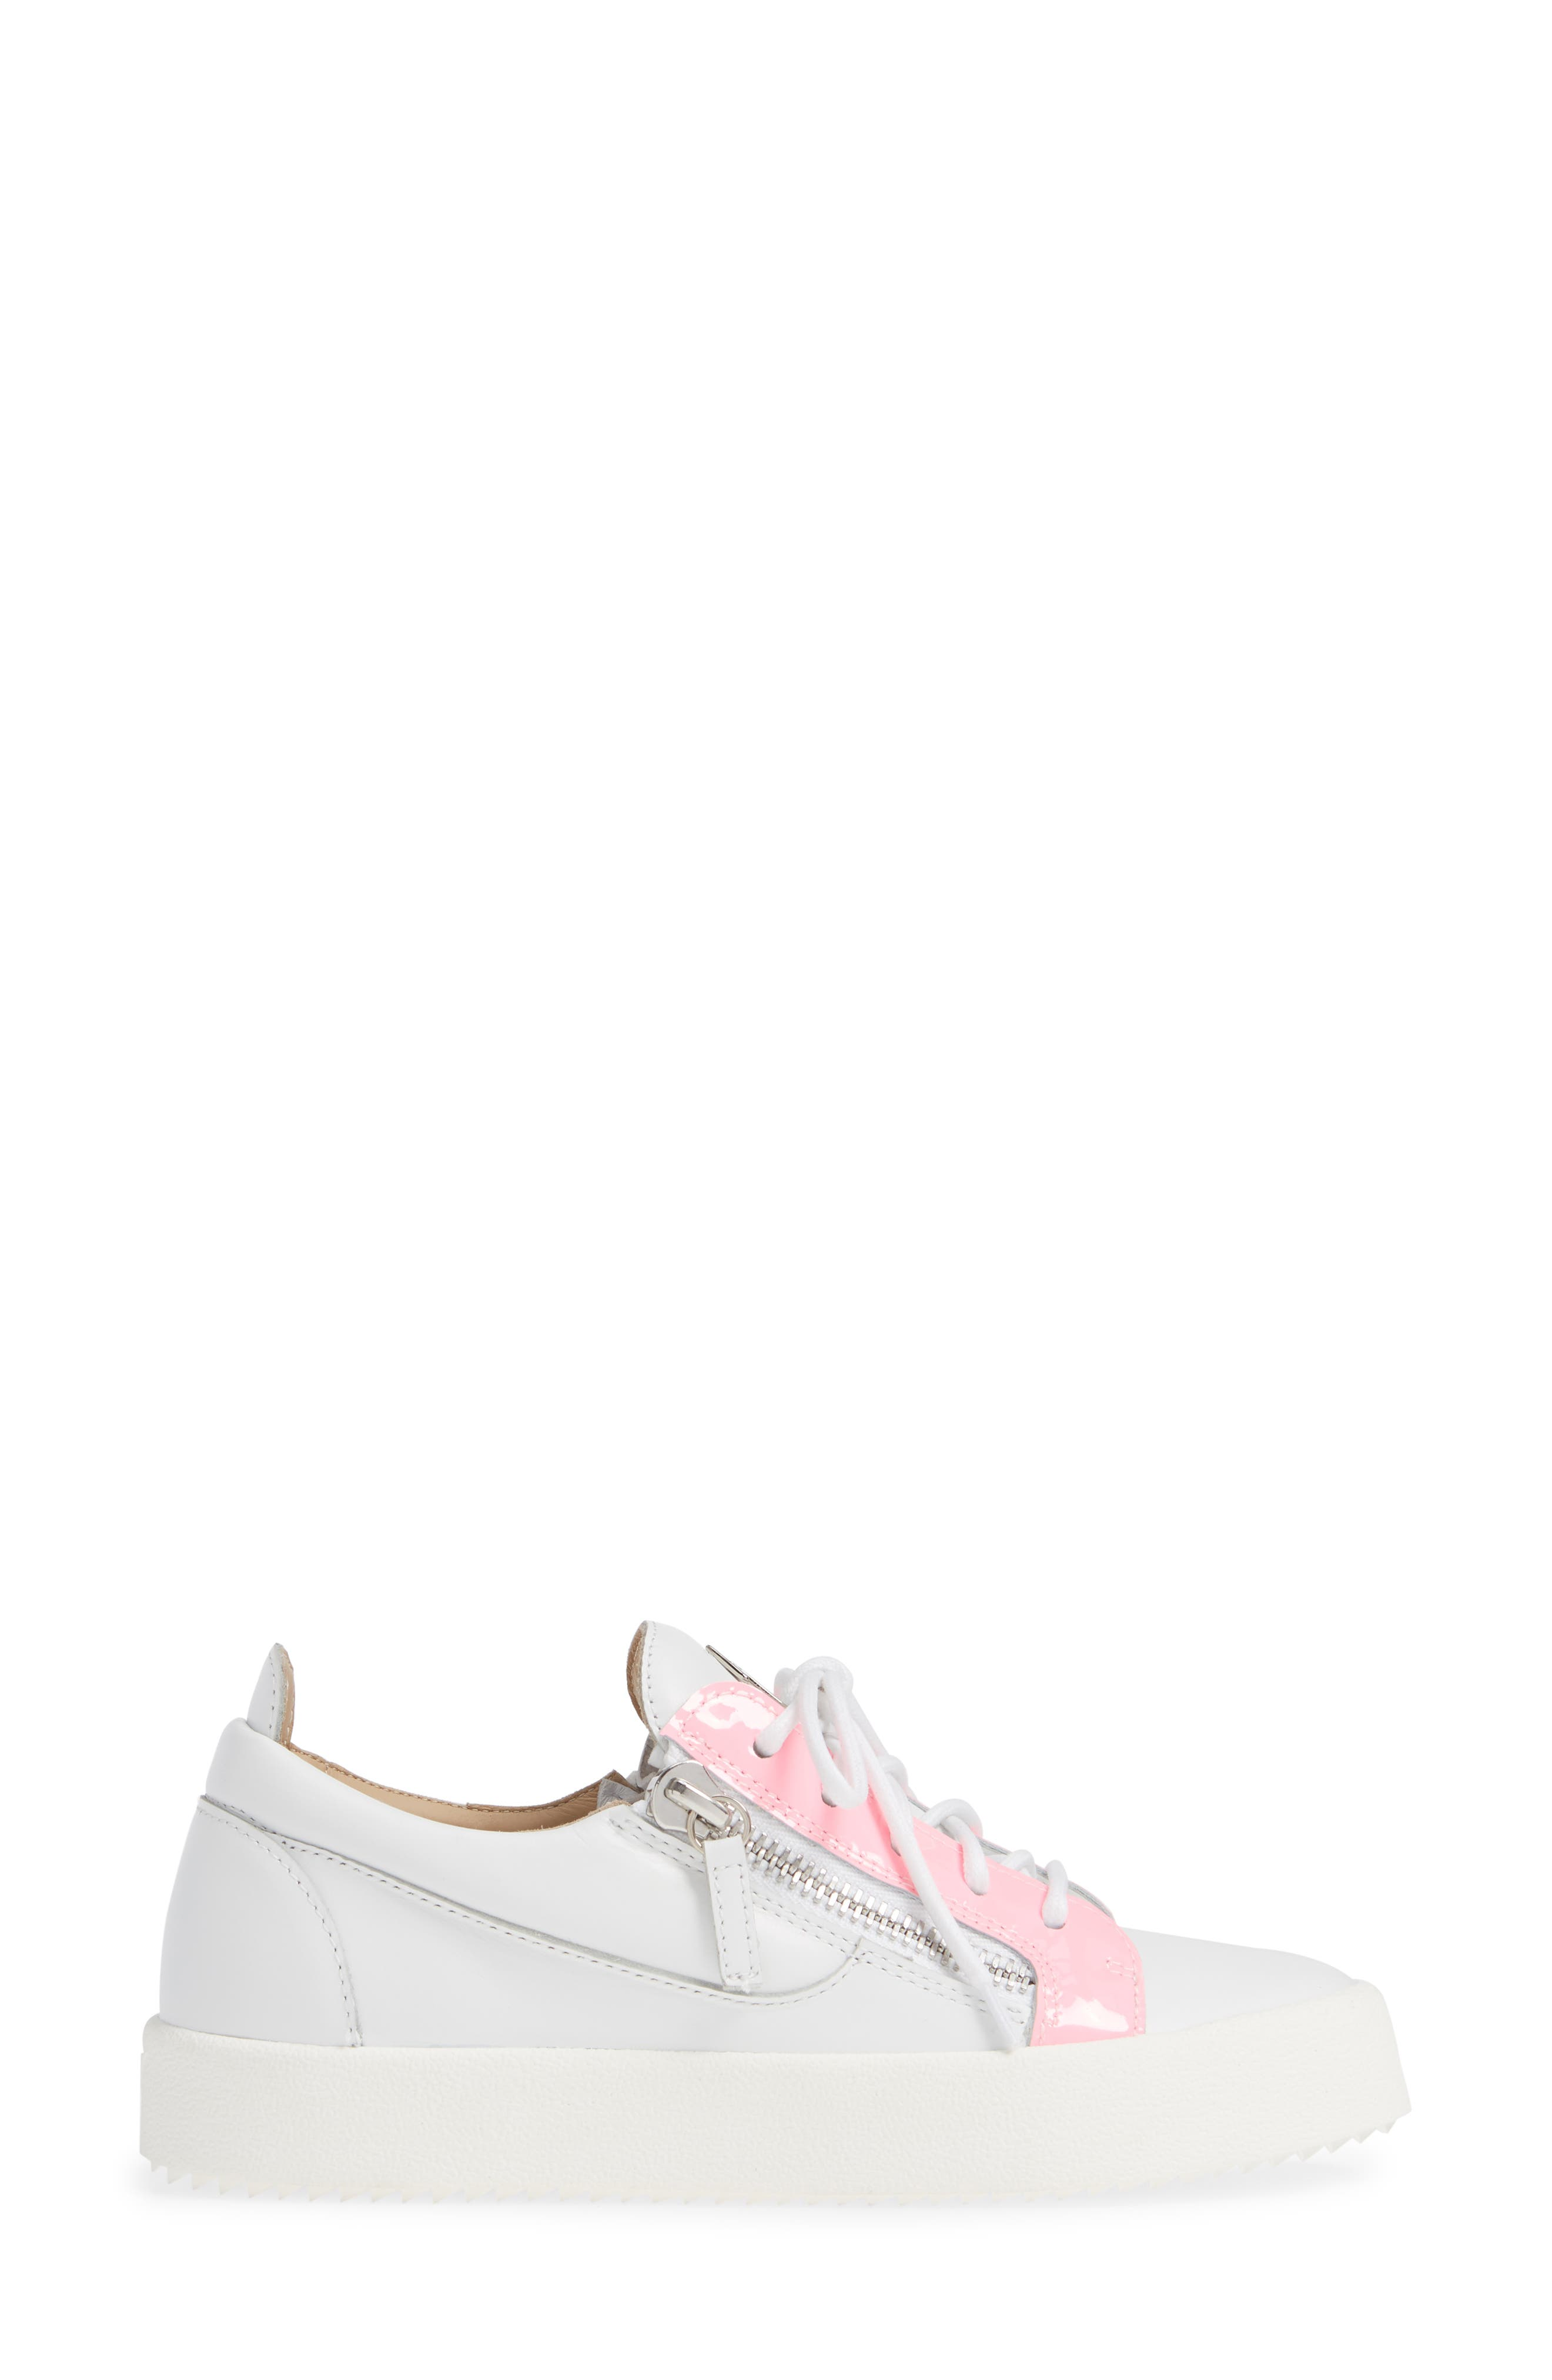 Low Top Sneaker,                             Alternate thumbnail 3, color,                             WHITE/ FUCHSIA